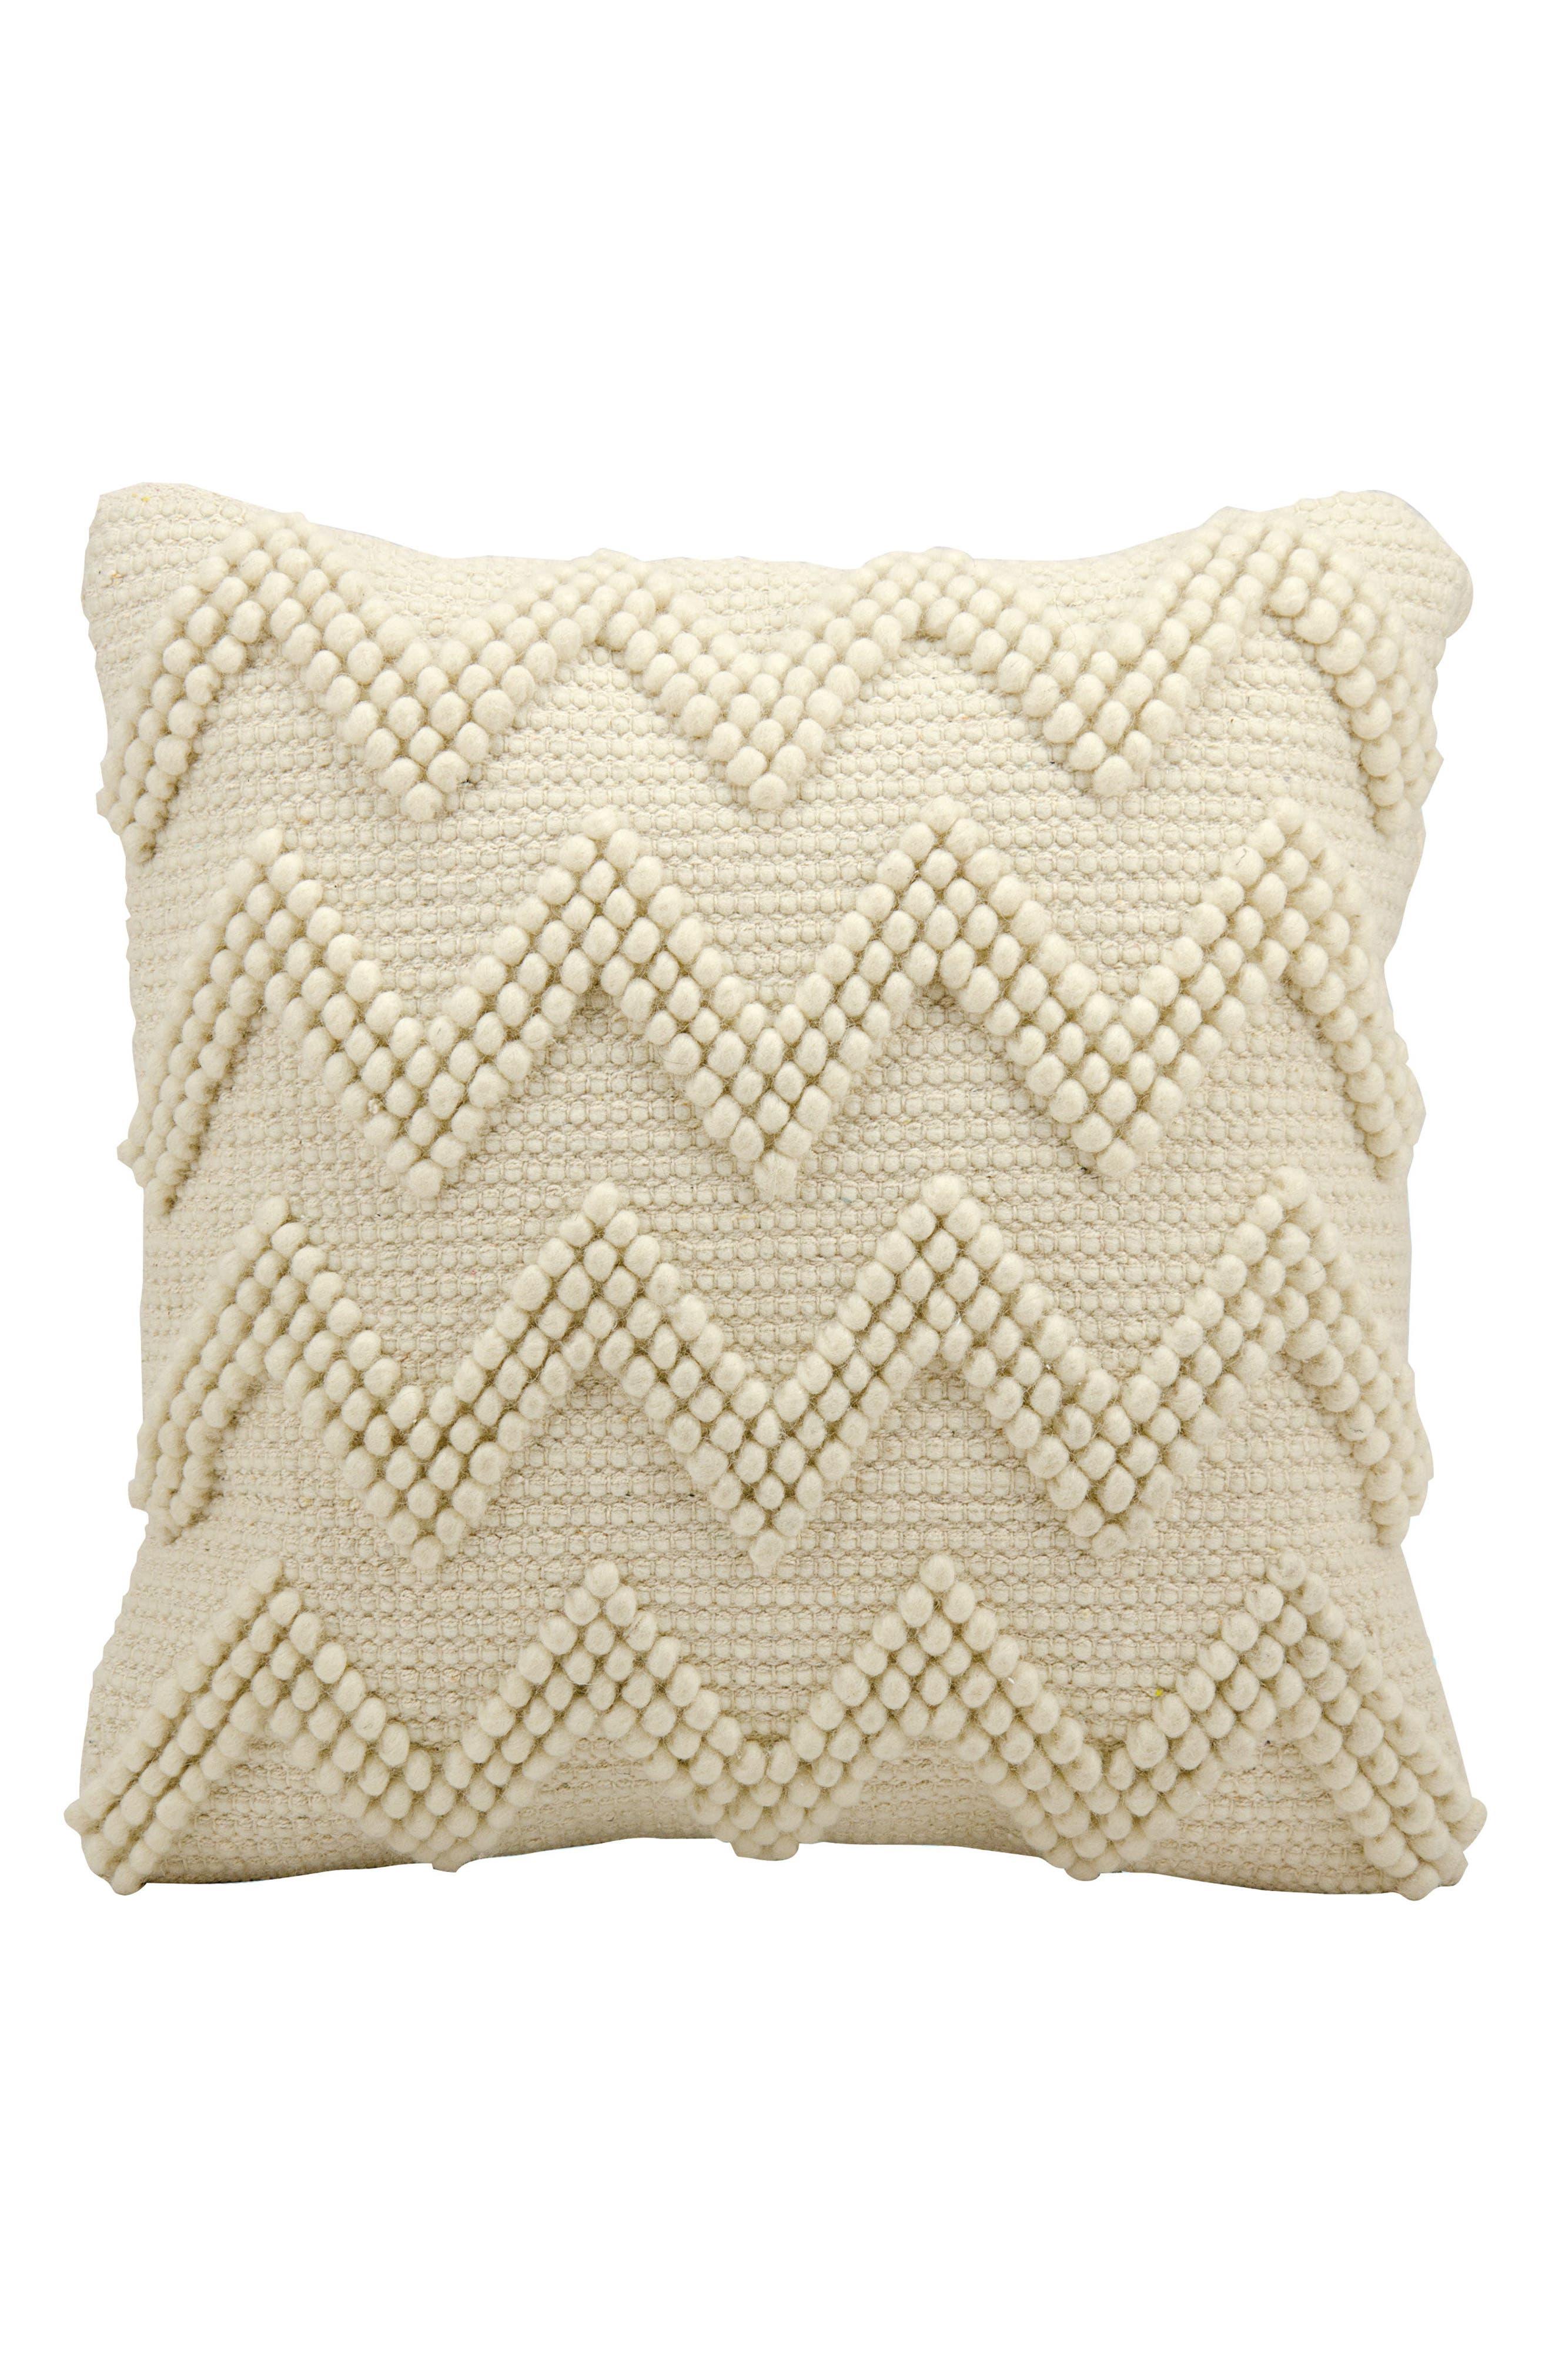 Chevron Pom Accent Pillow,                             Main thumbnail 1, color,                             Ivory